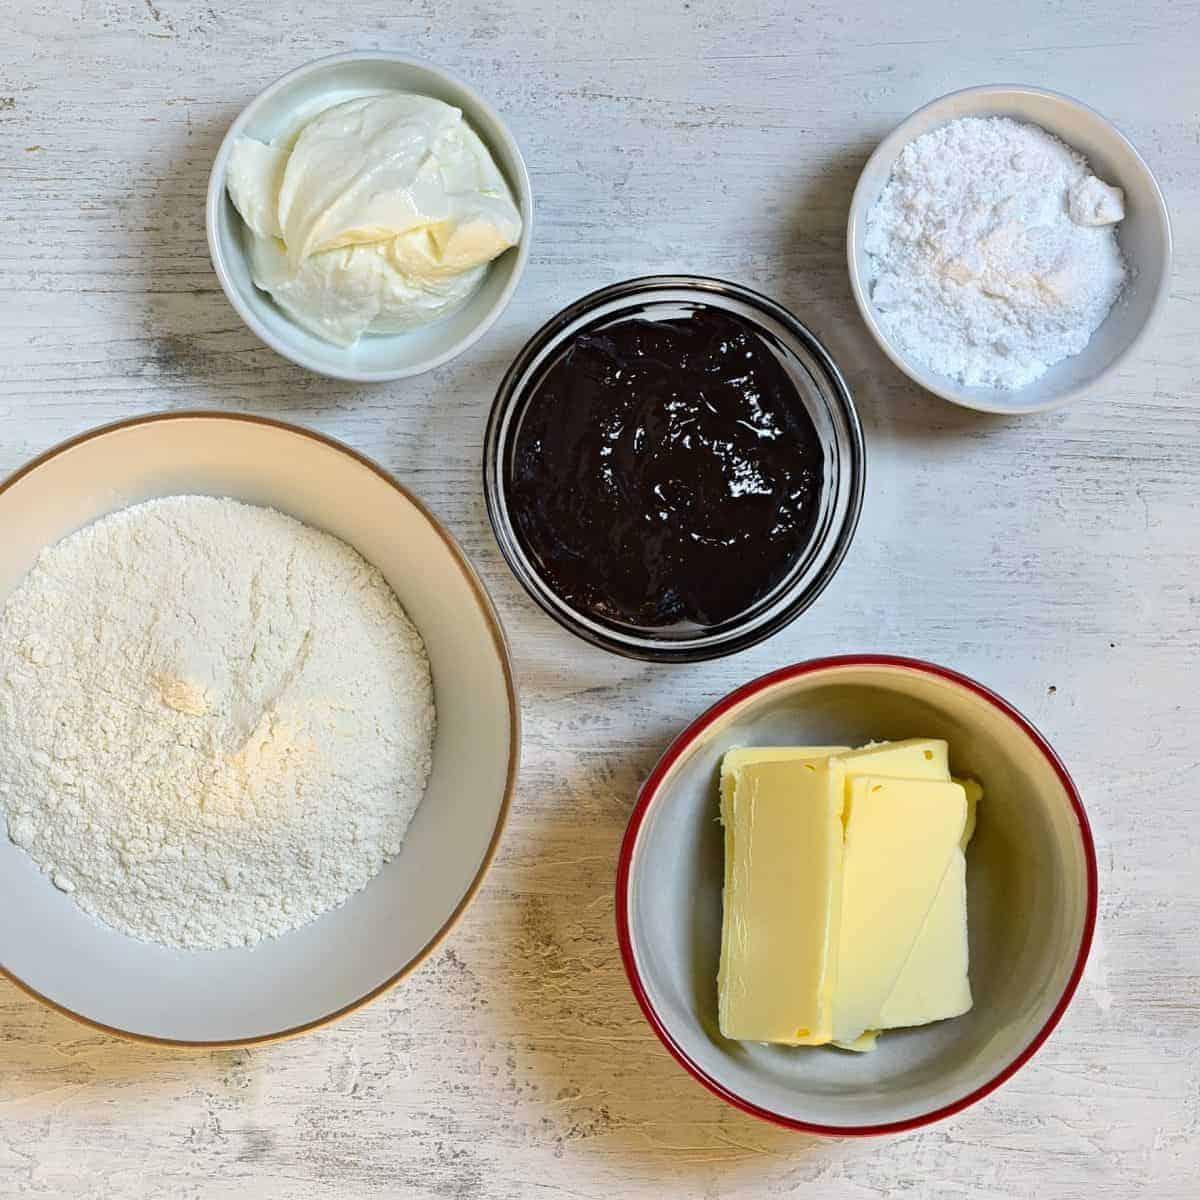 kolacky ingredients